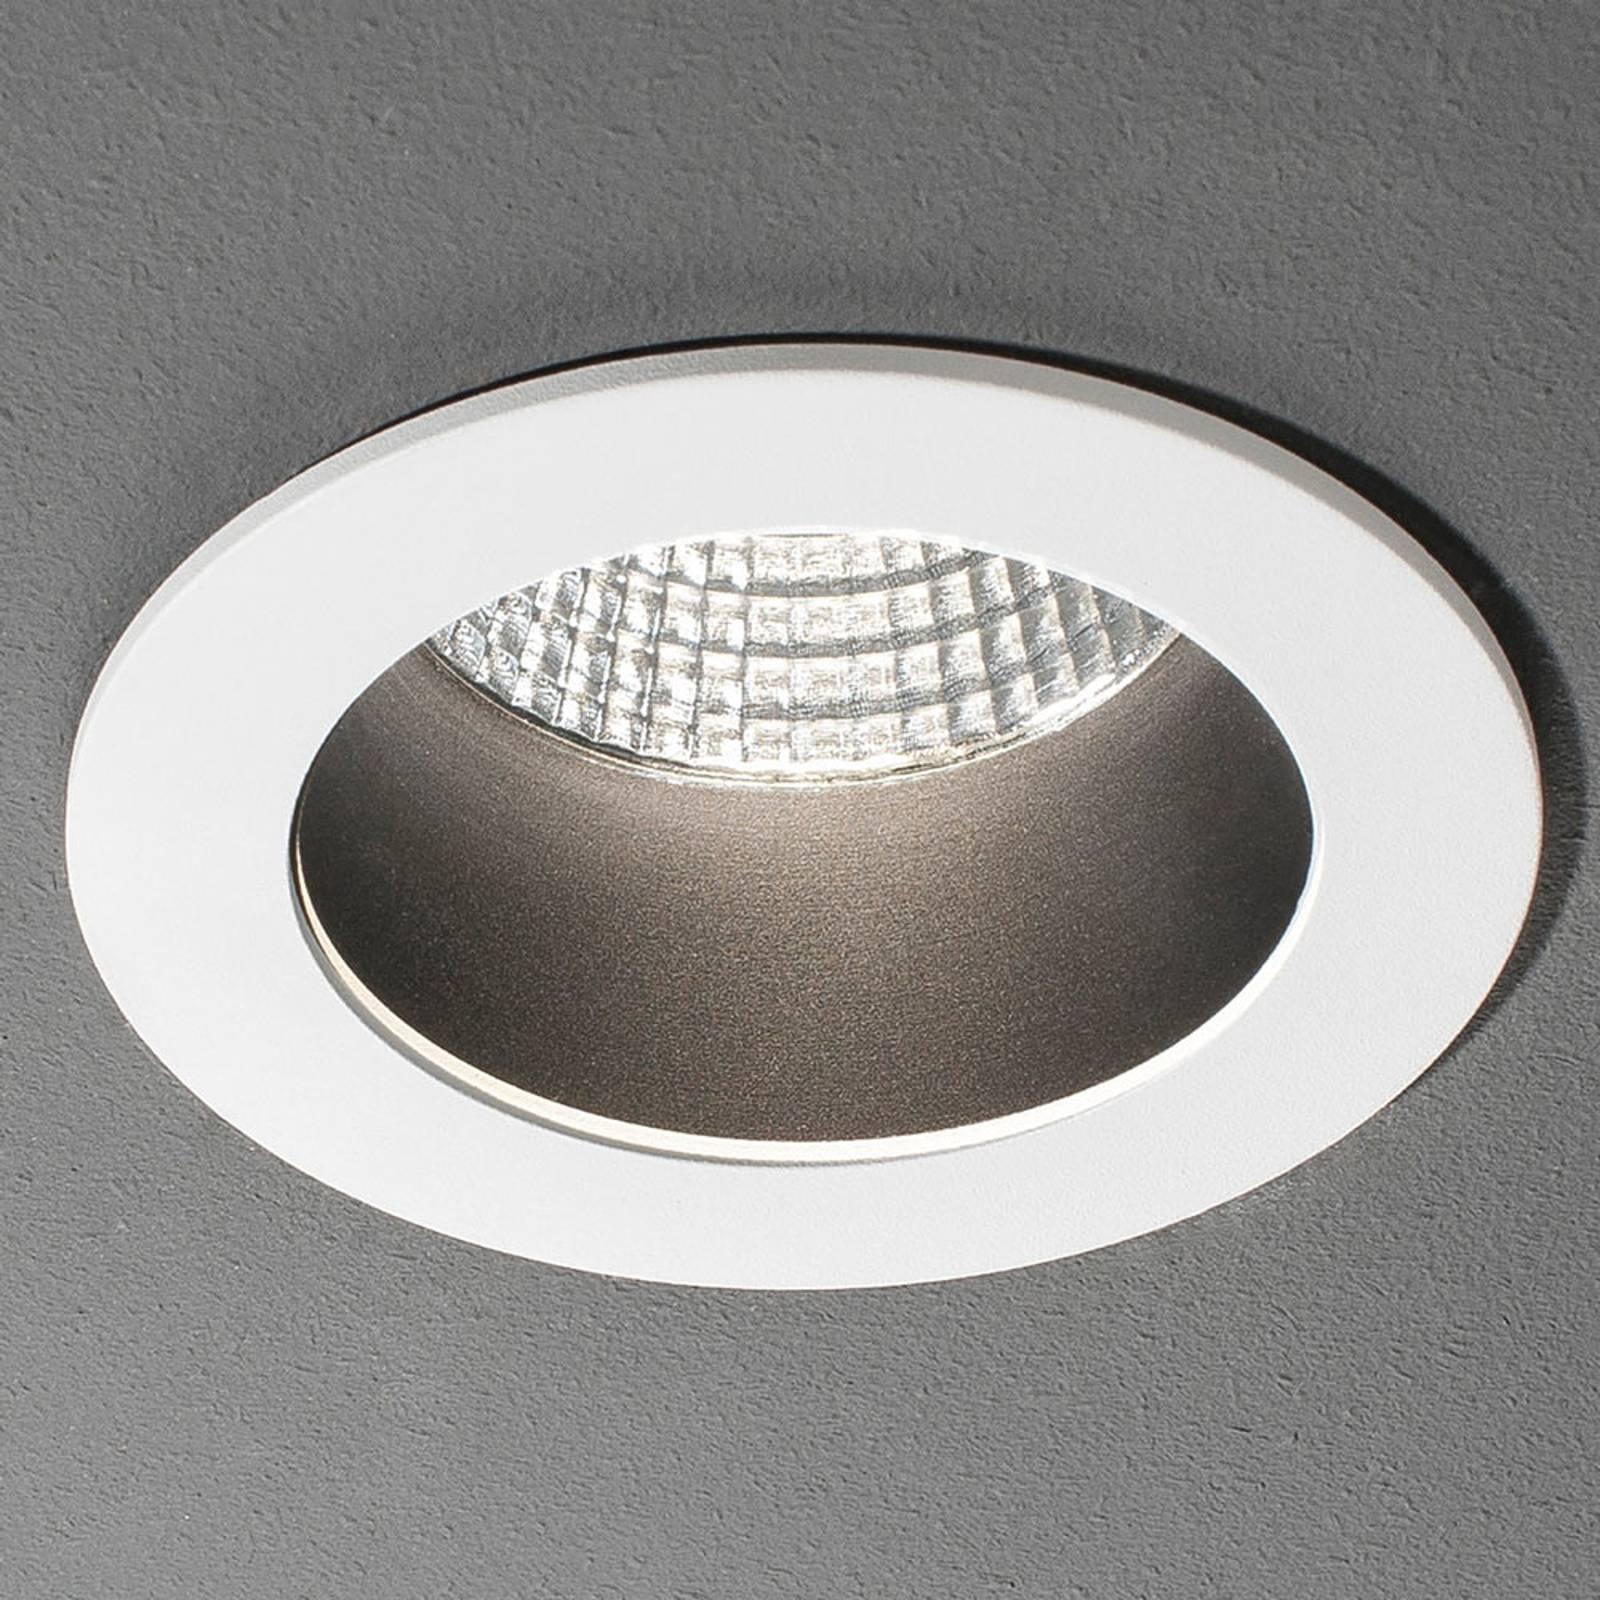 Spot encastrable LED Look Round big, blanc